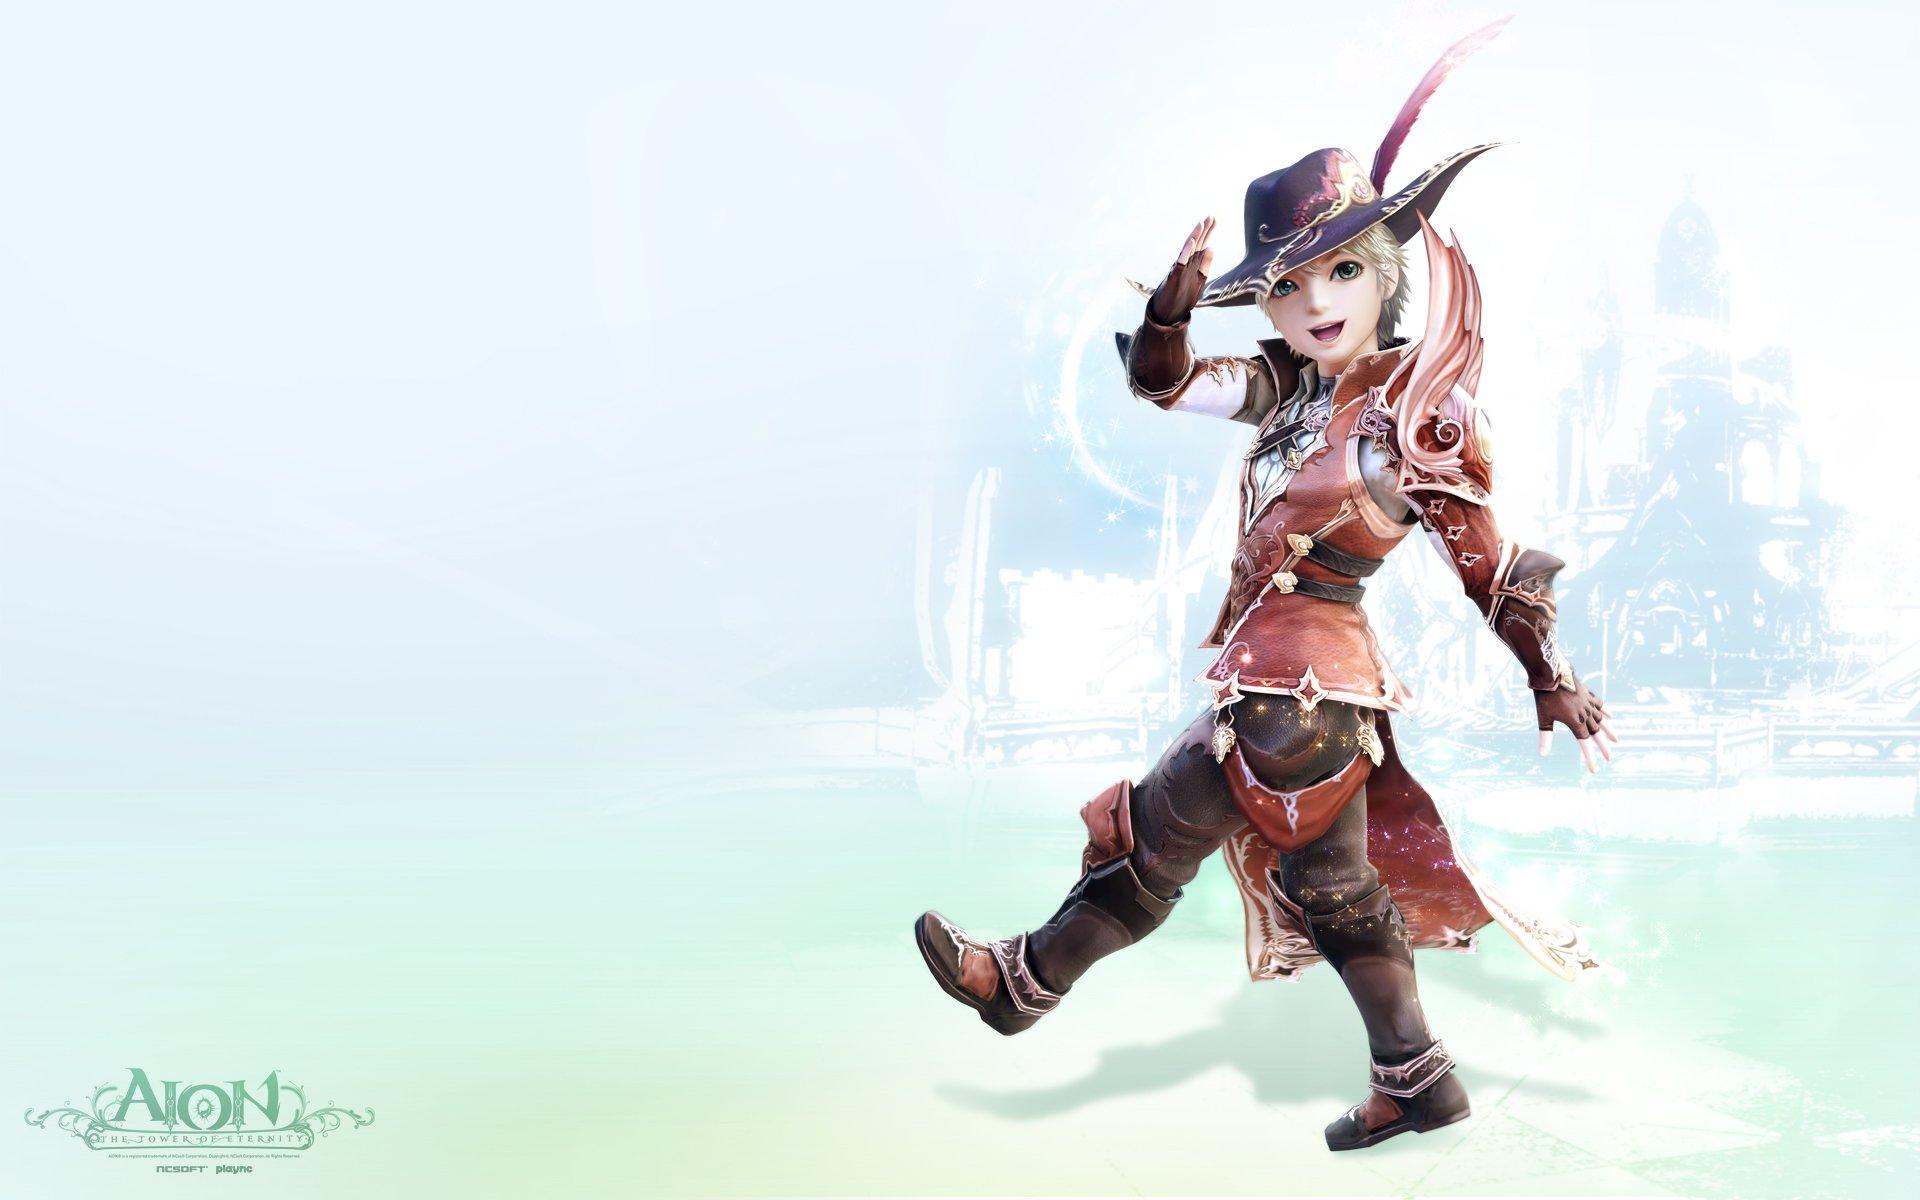 Картинки персонажей айон